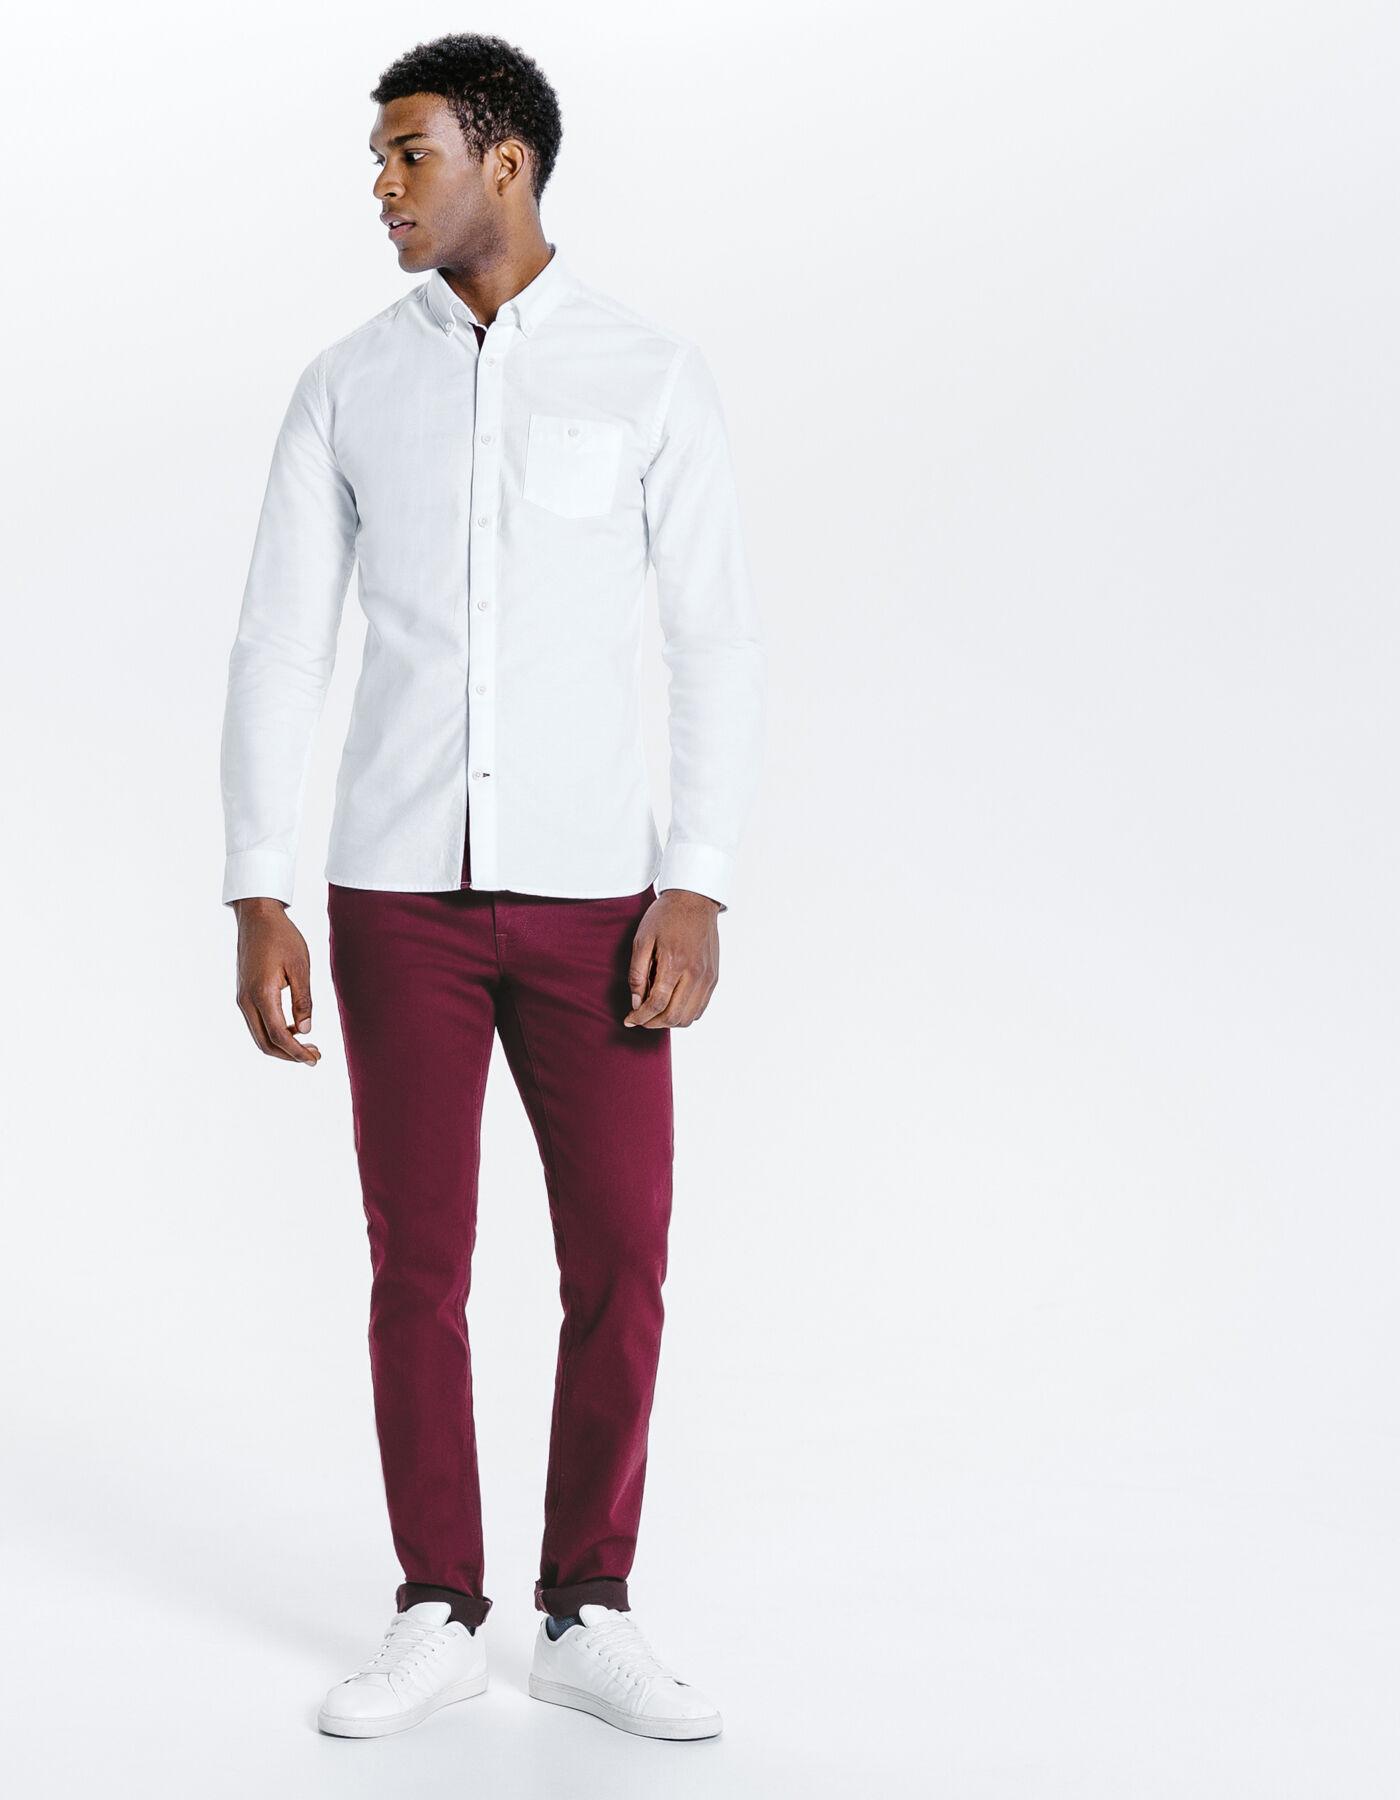 pantalon 5 poches slim bordeau homme jules. Black Bedroom Furniture Sets. Home Design Ideas